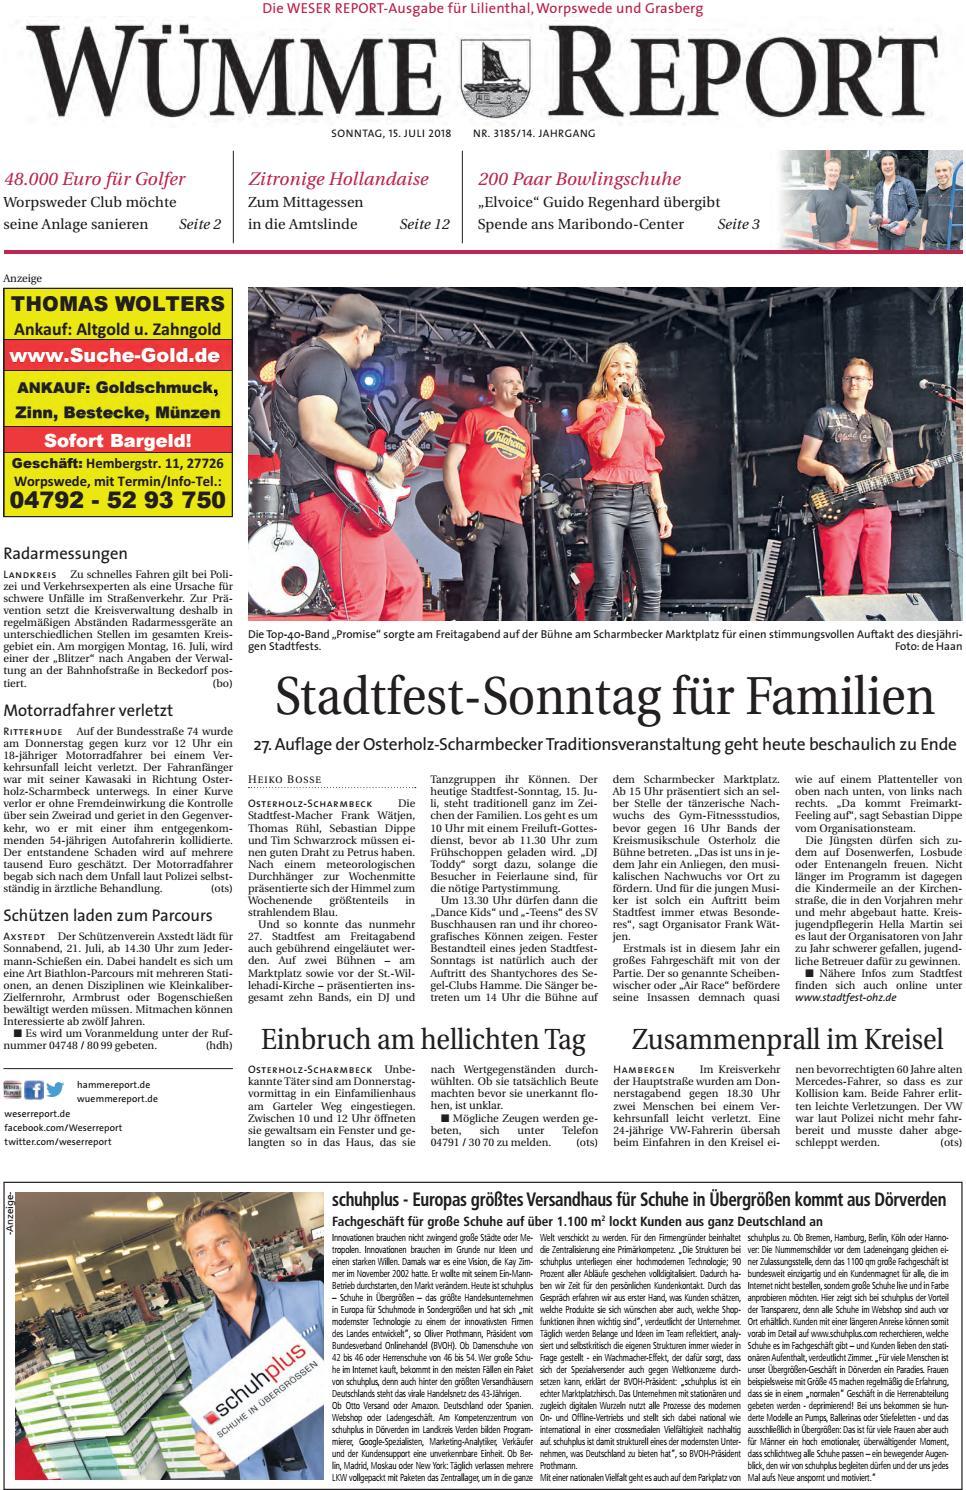 Wümme Report vom 15.07.2018 by KPS Verlagsgesellschaft mbH - issuu